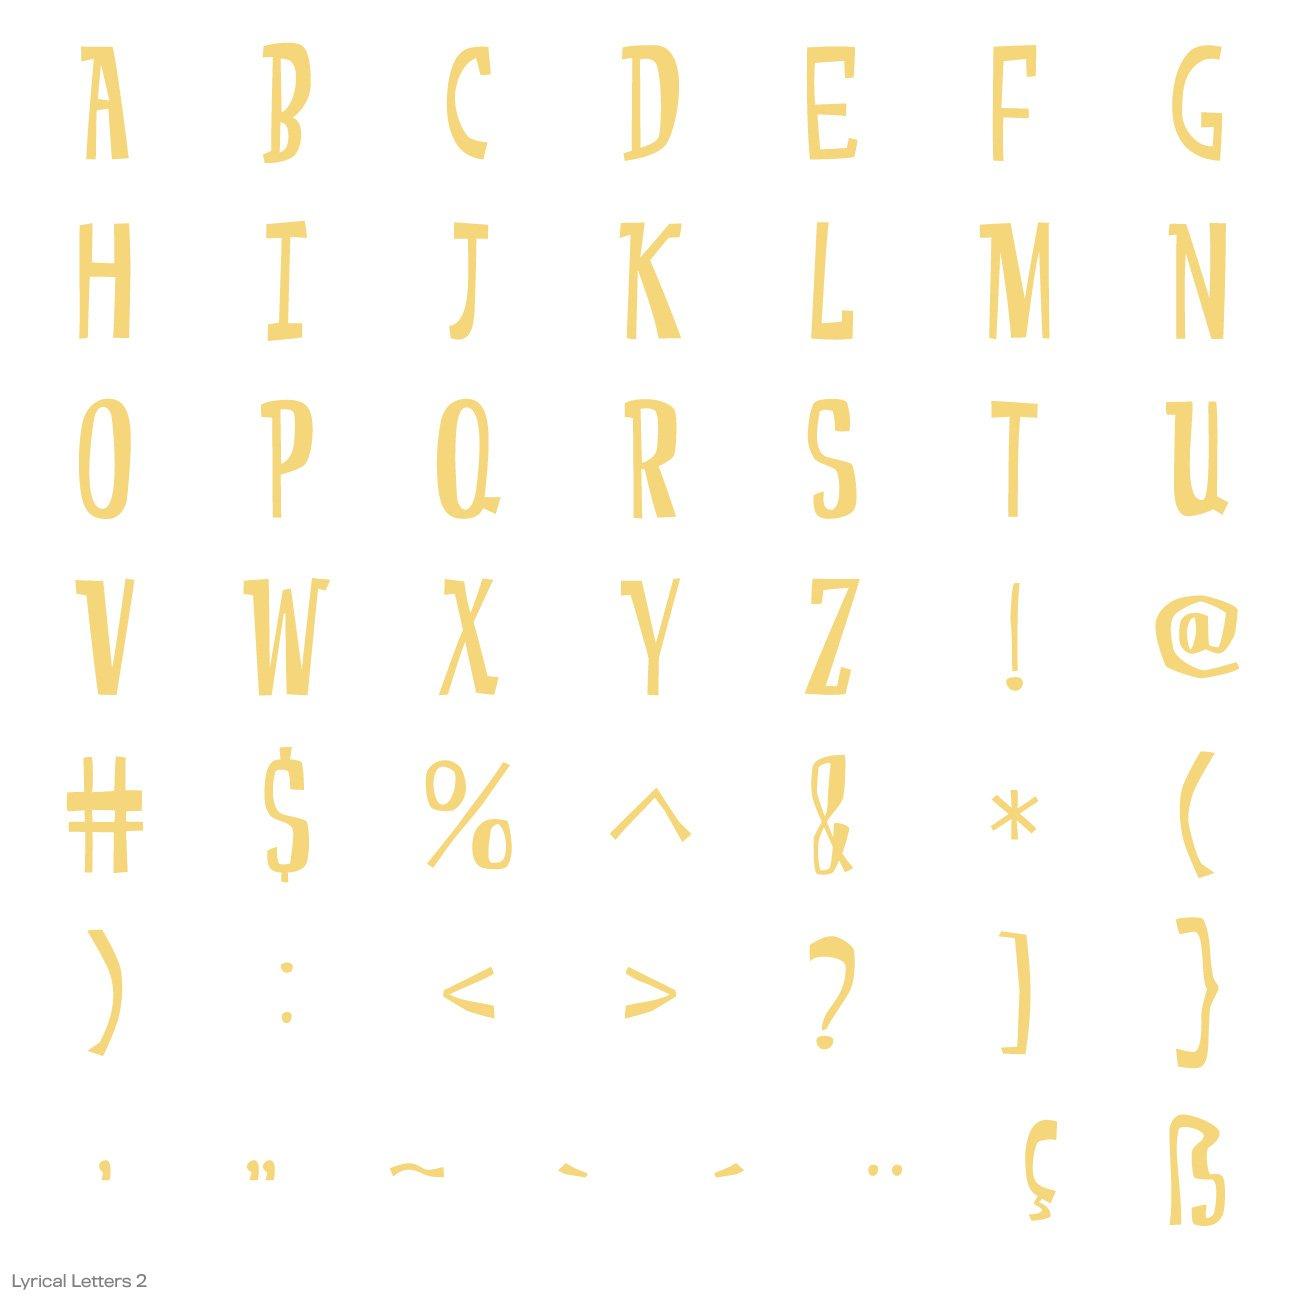 Cricut Lyrical Letters 2 Cartridge by Cricut (Image #11)